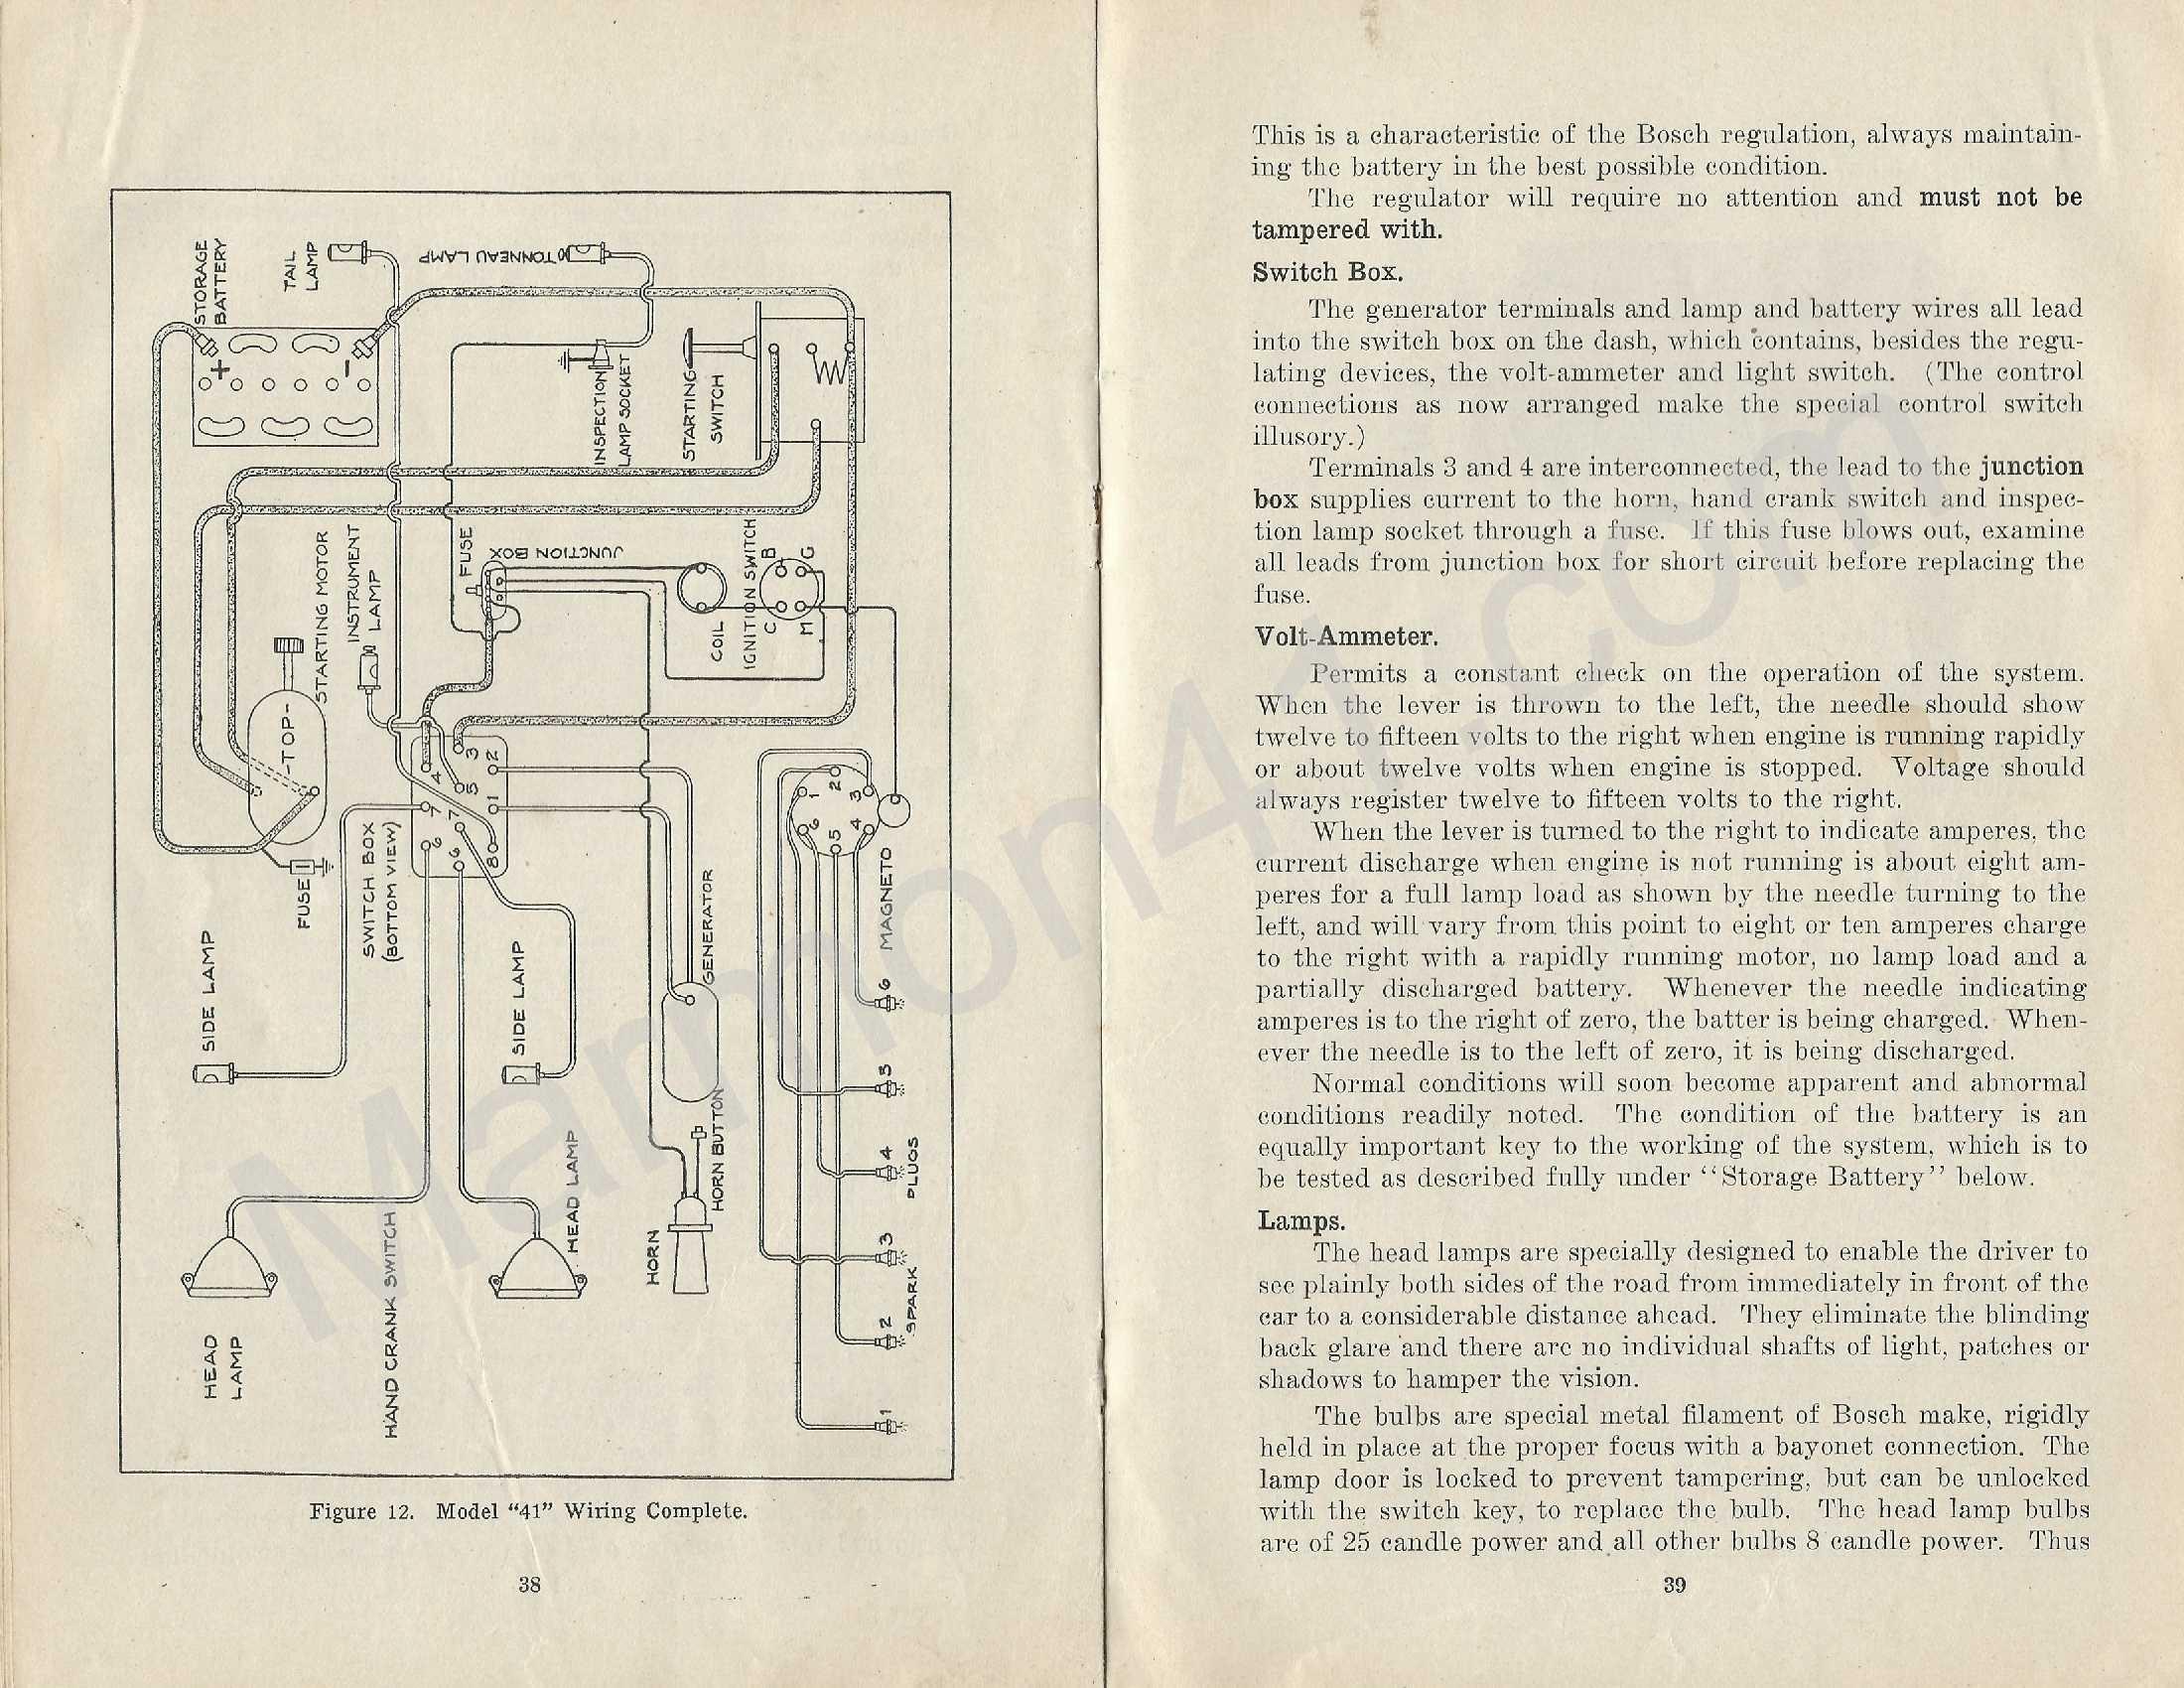 1915-07-01_Marmon41_Info_Book_1534-B_21